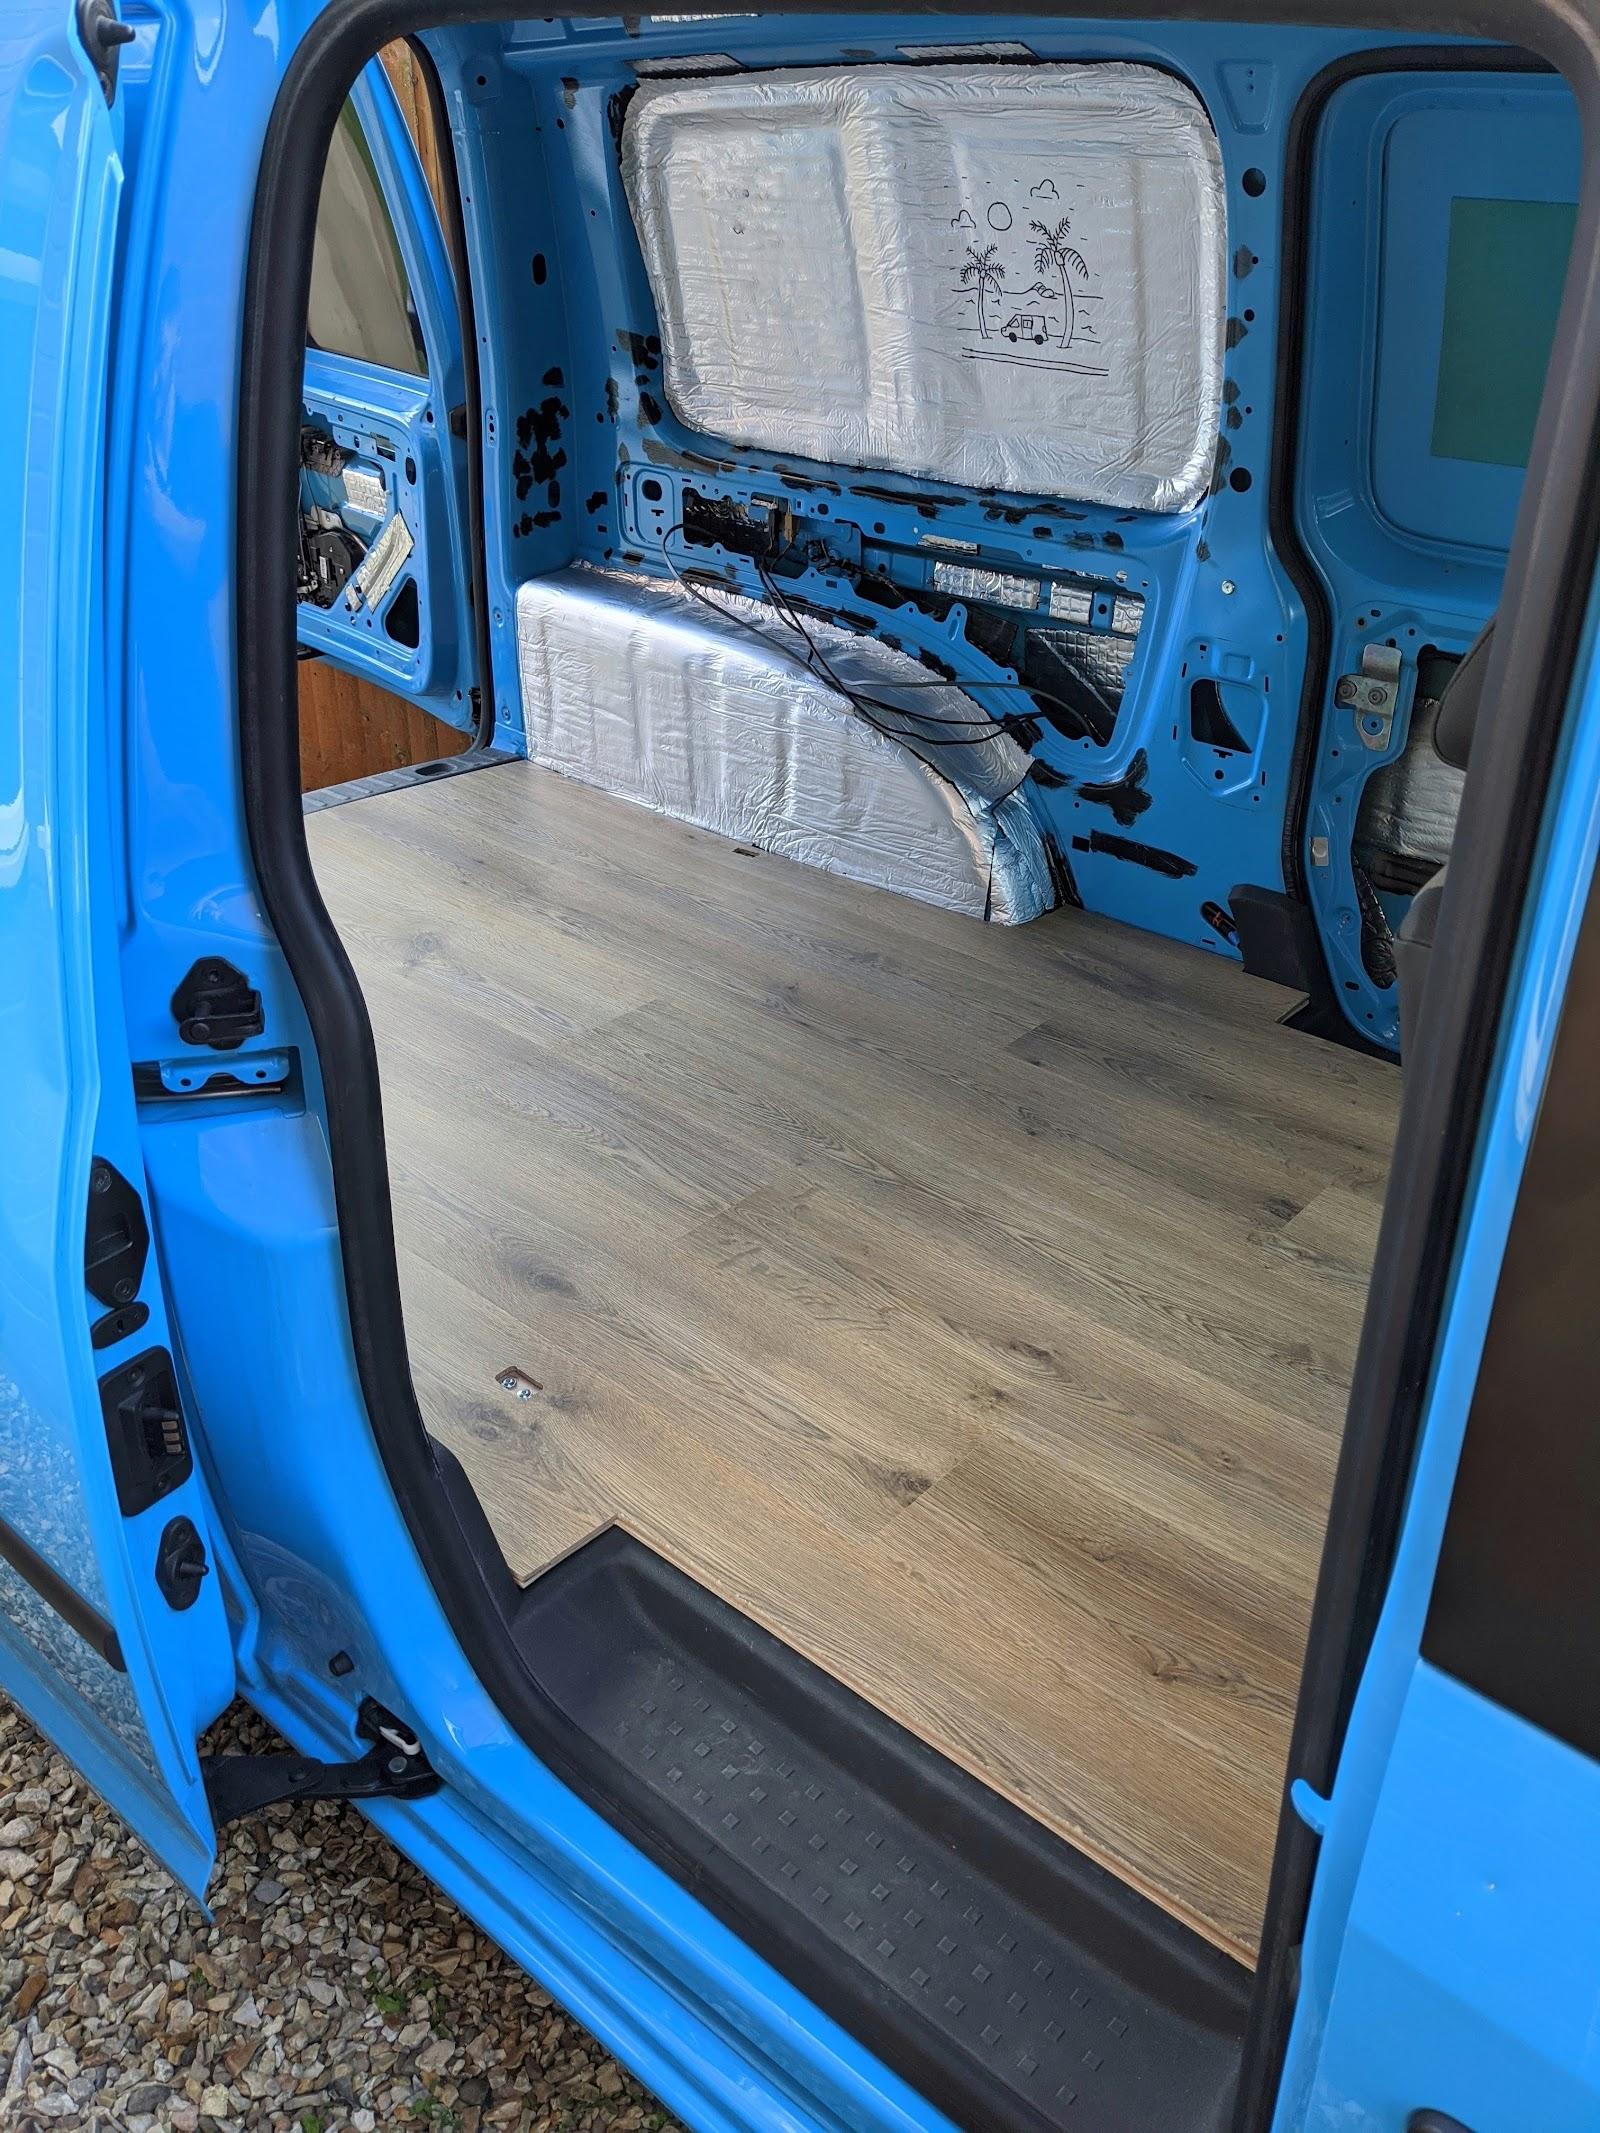 Insulation & flooring